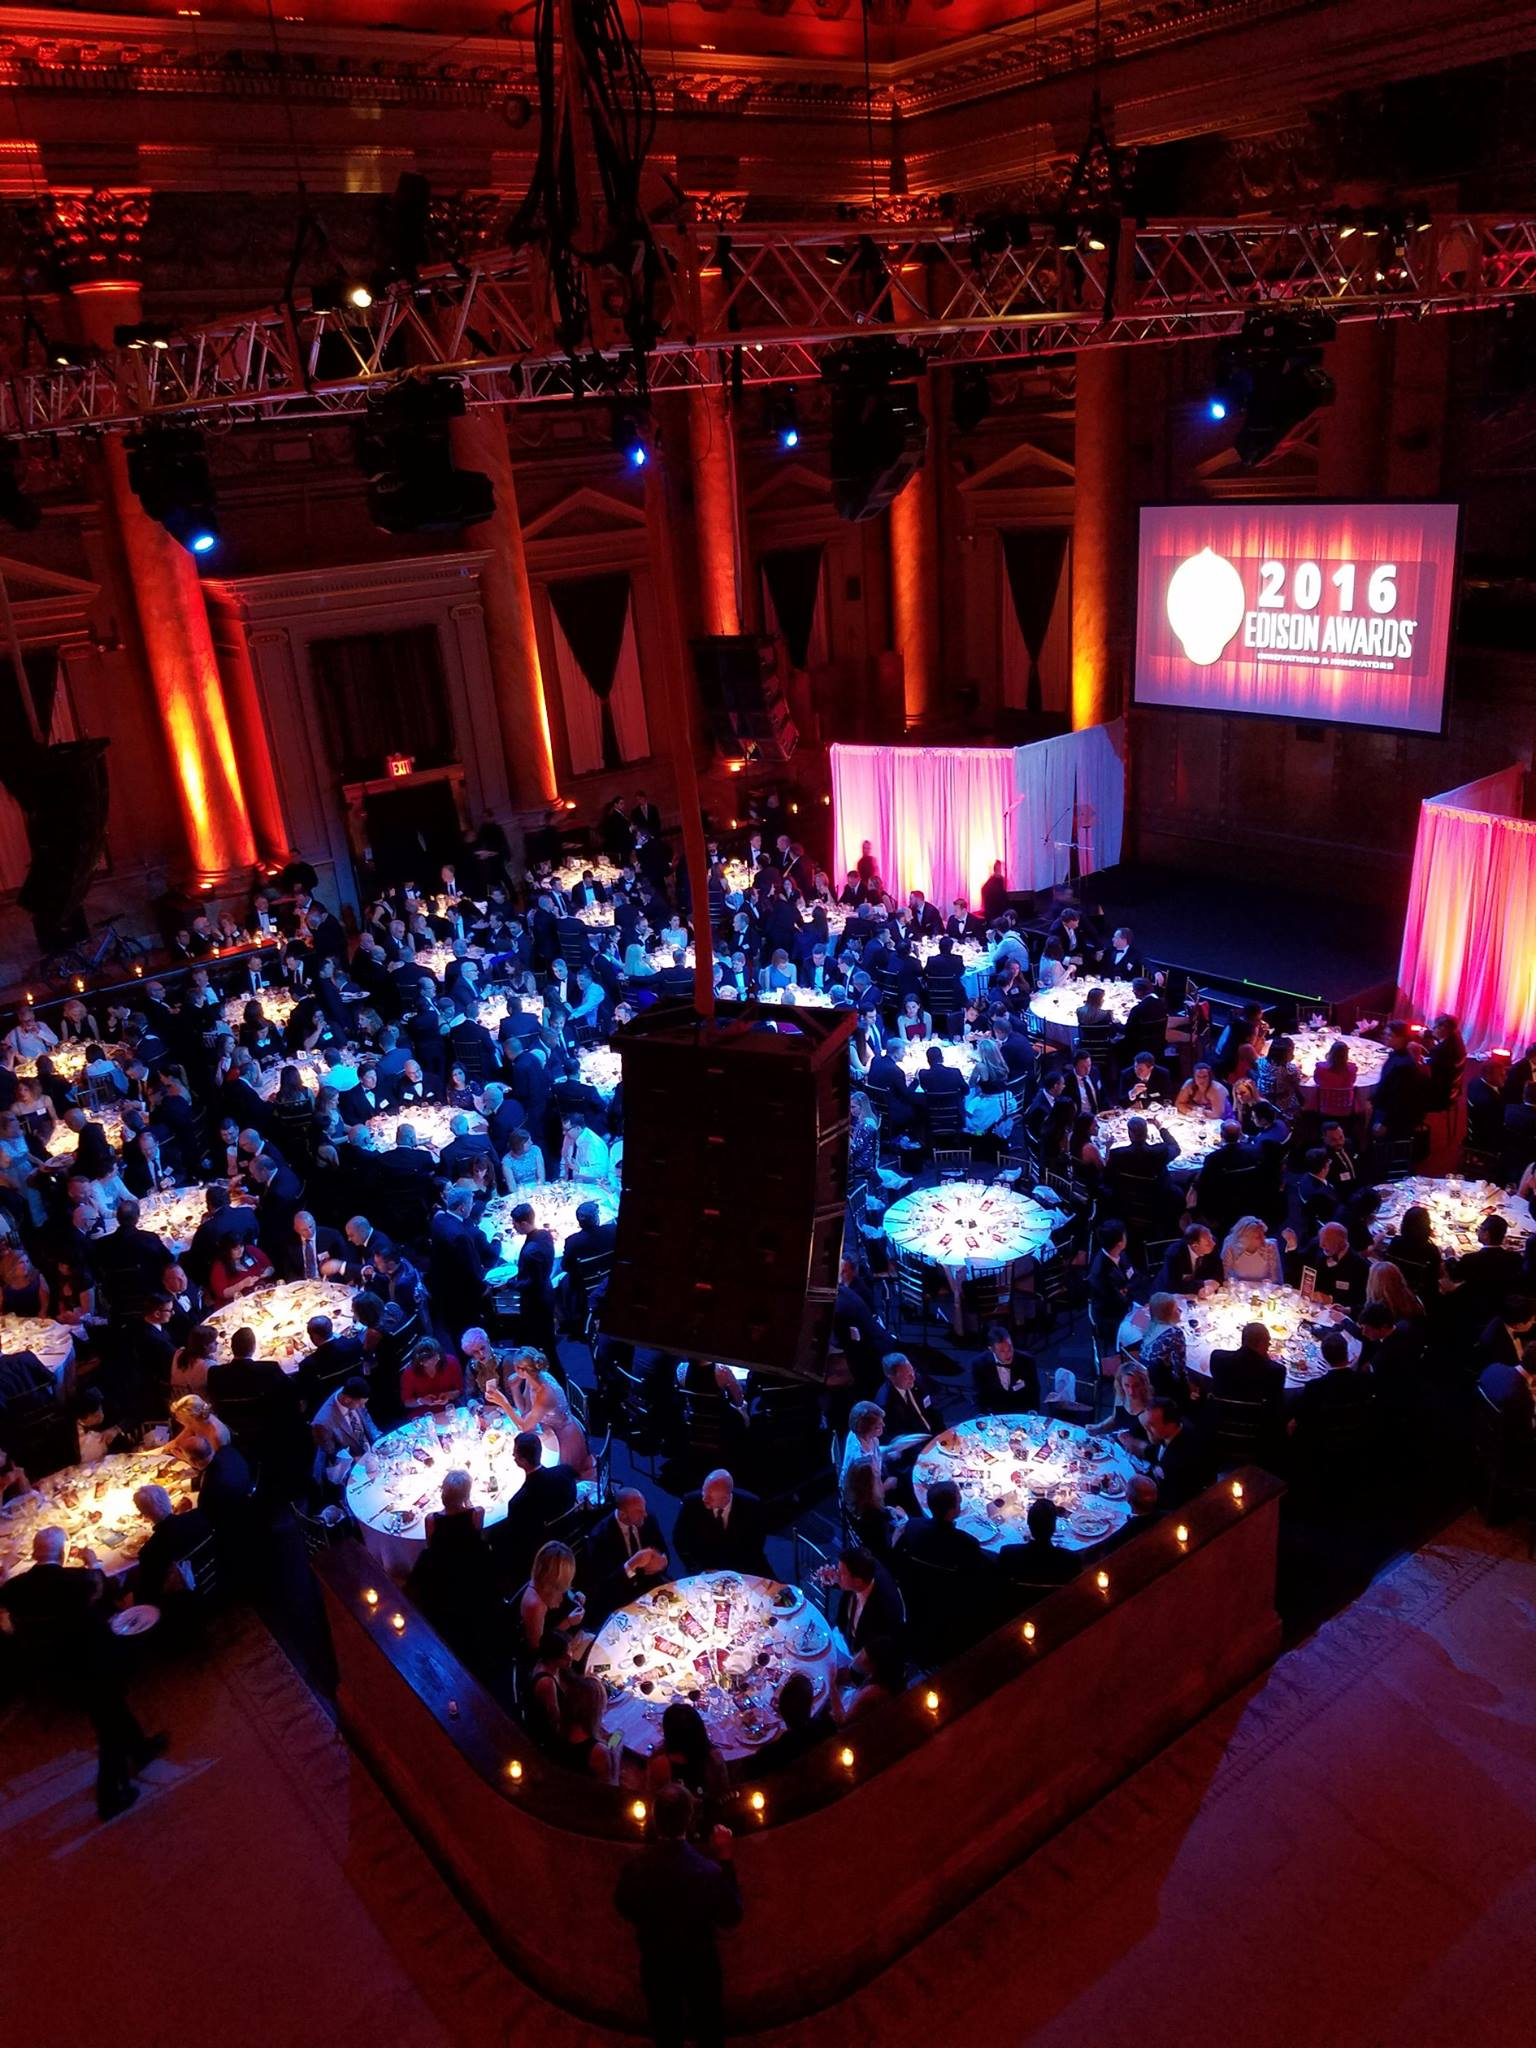 2016 Edison Awards Gala Arial View